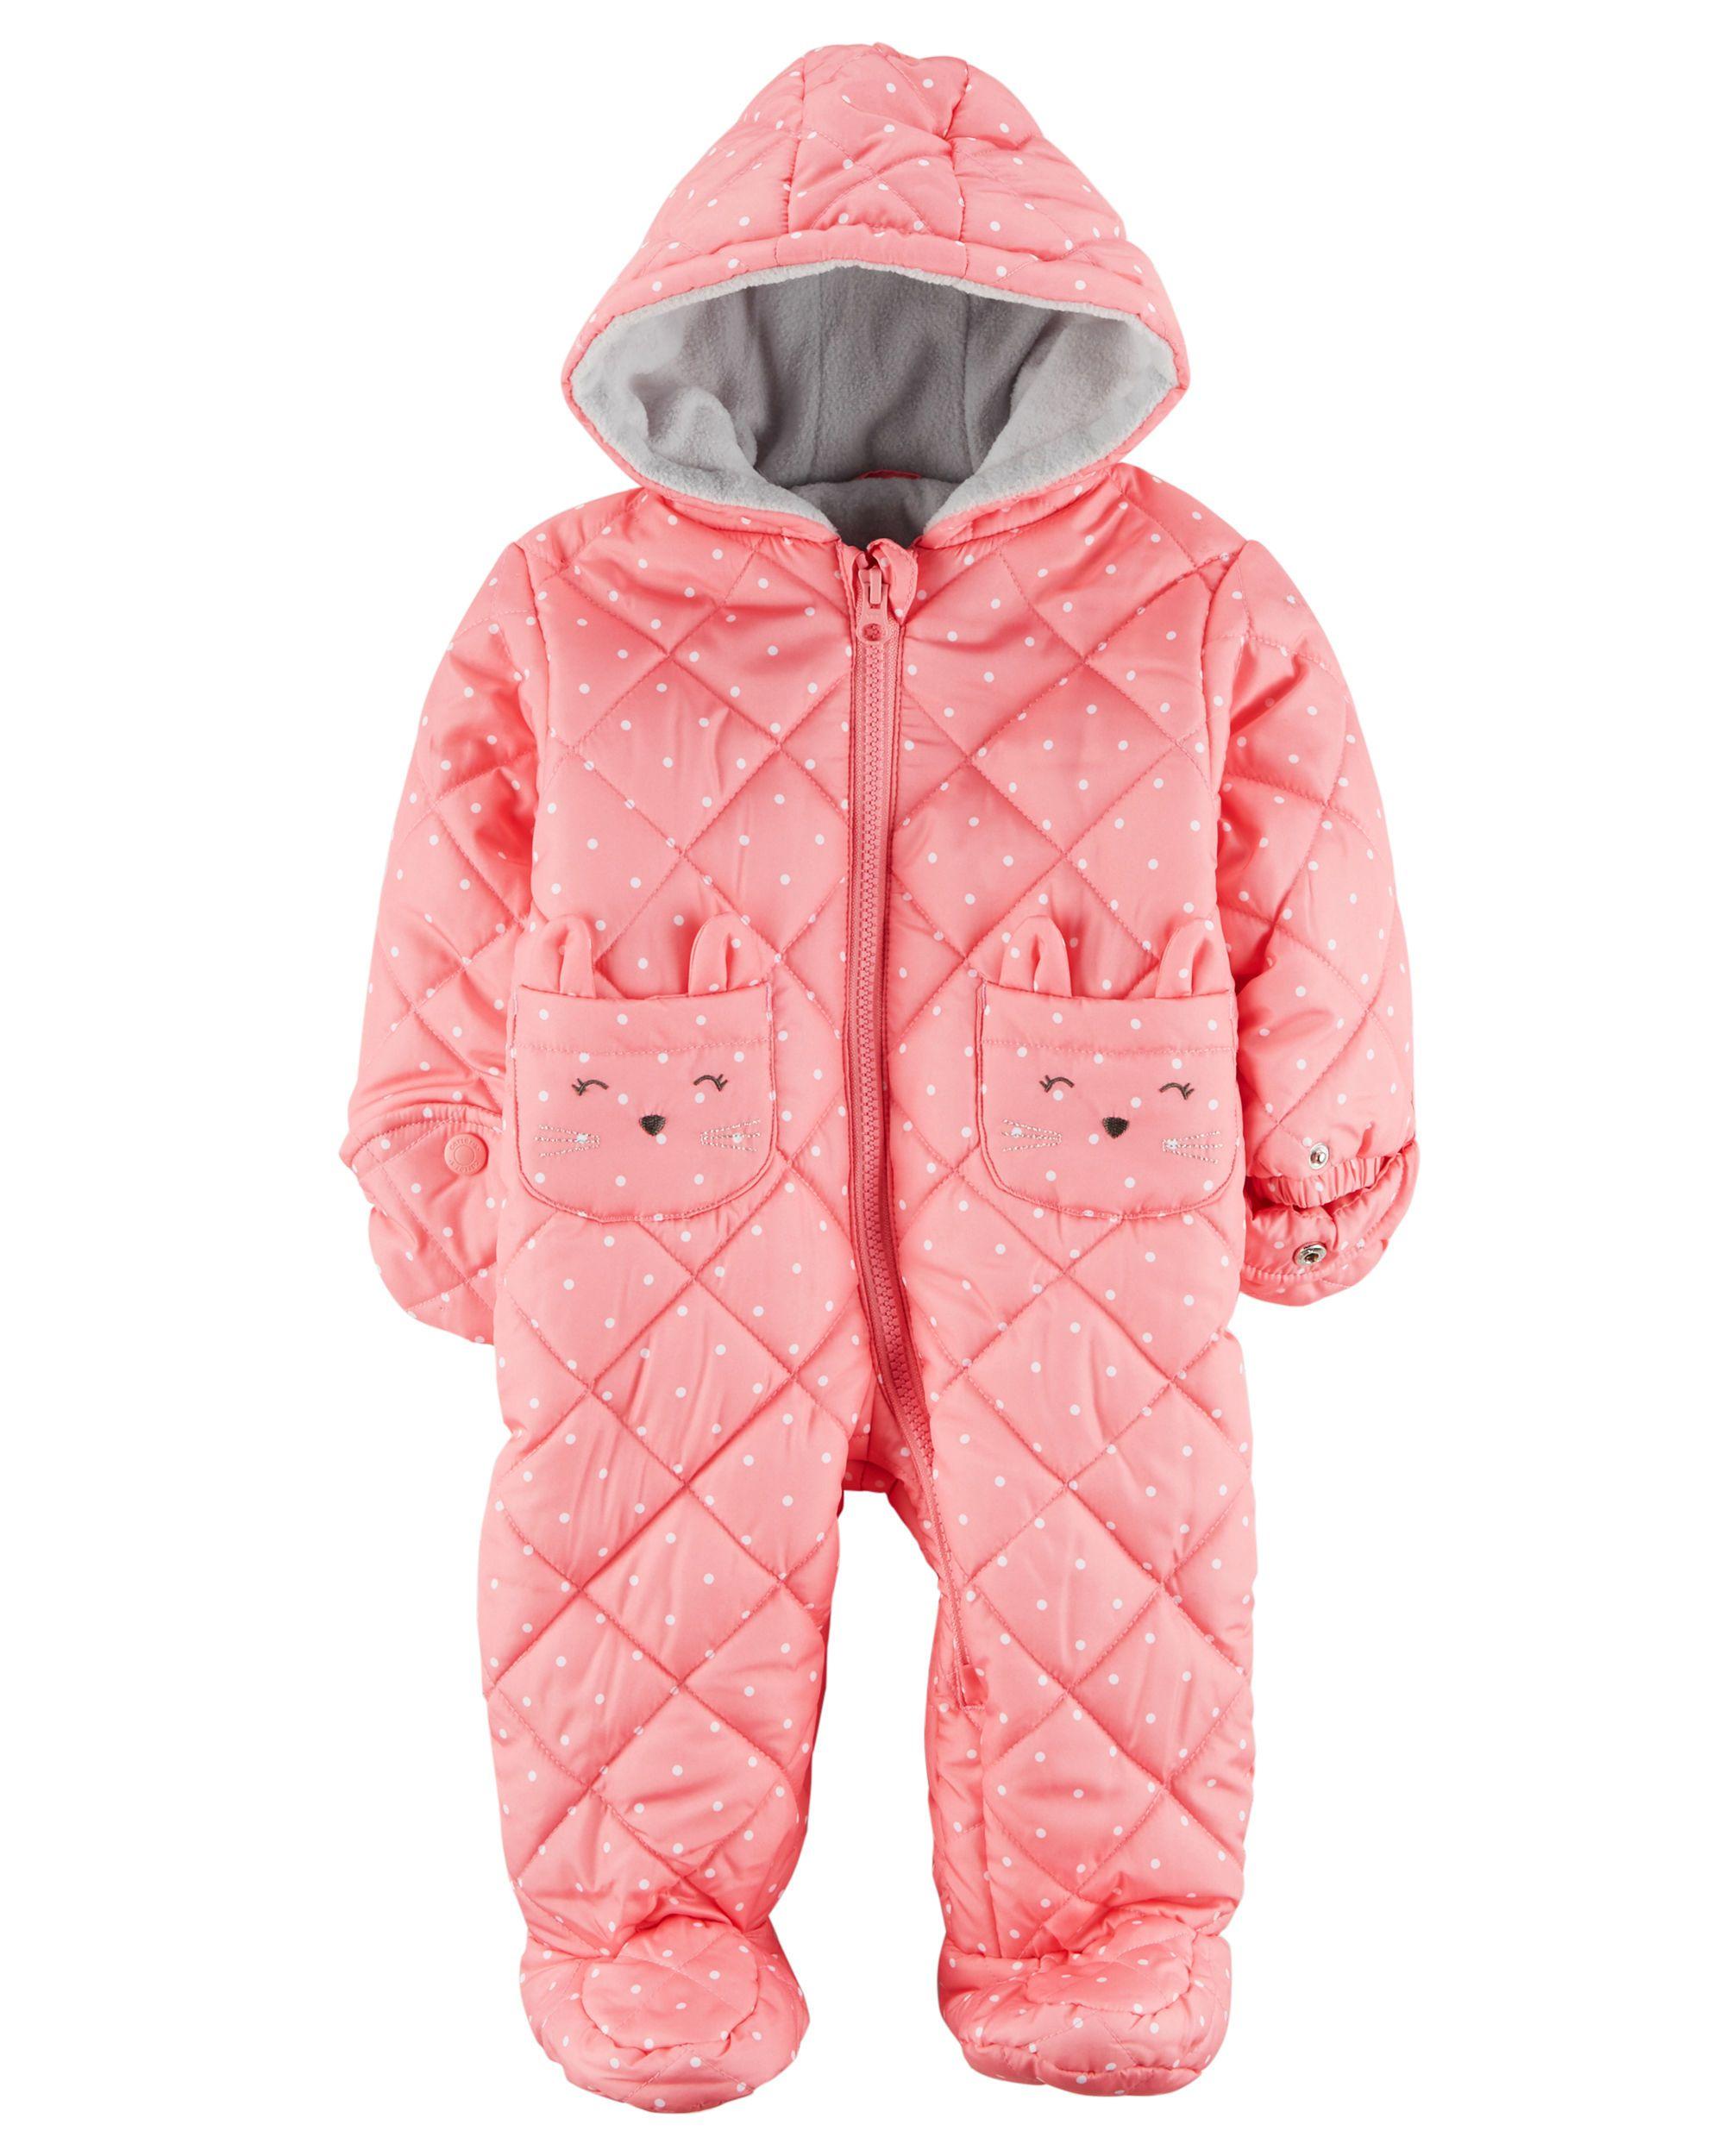 Infant 1 Piece Snowsuit Carter S Oshkosh Canada Baby Clothes